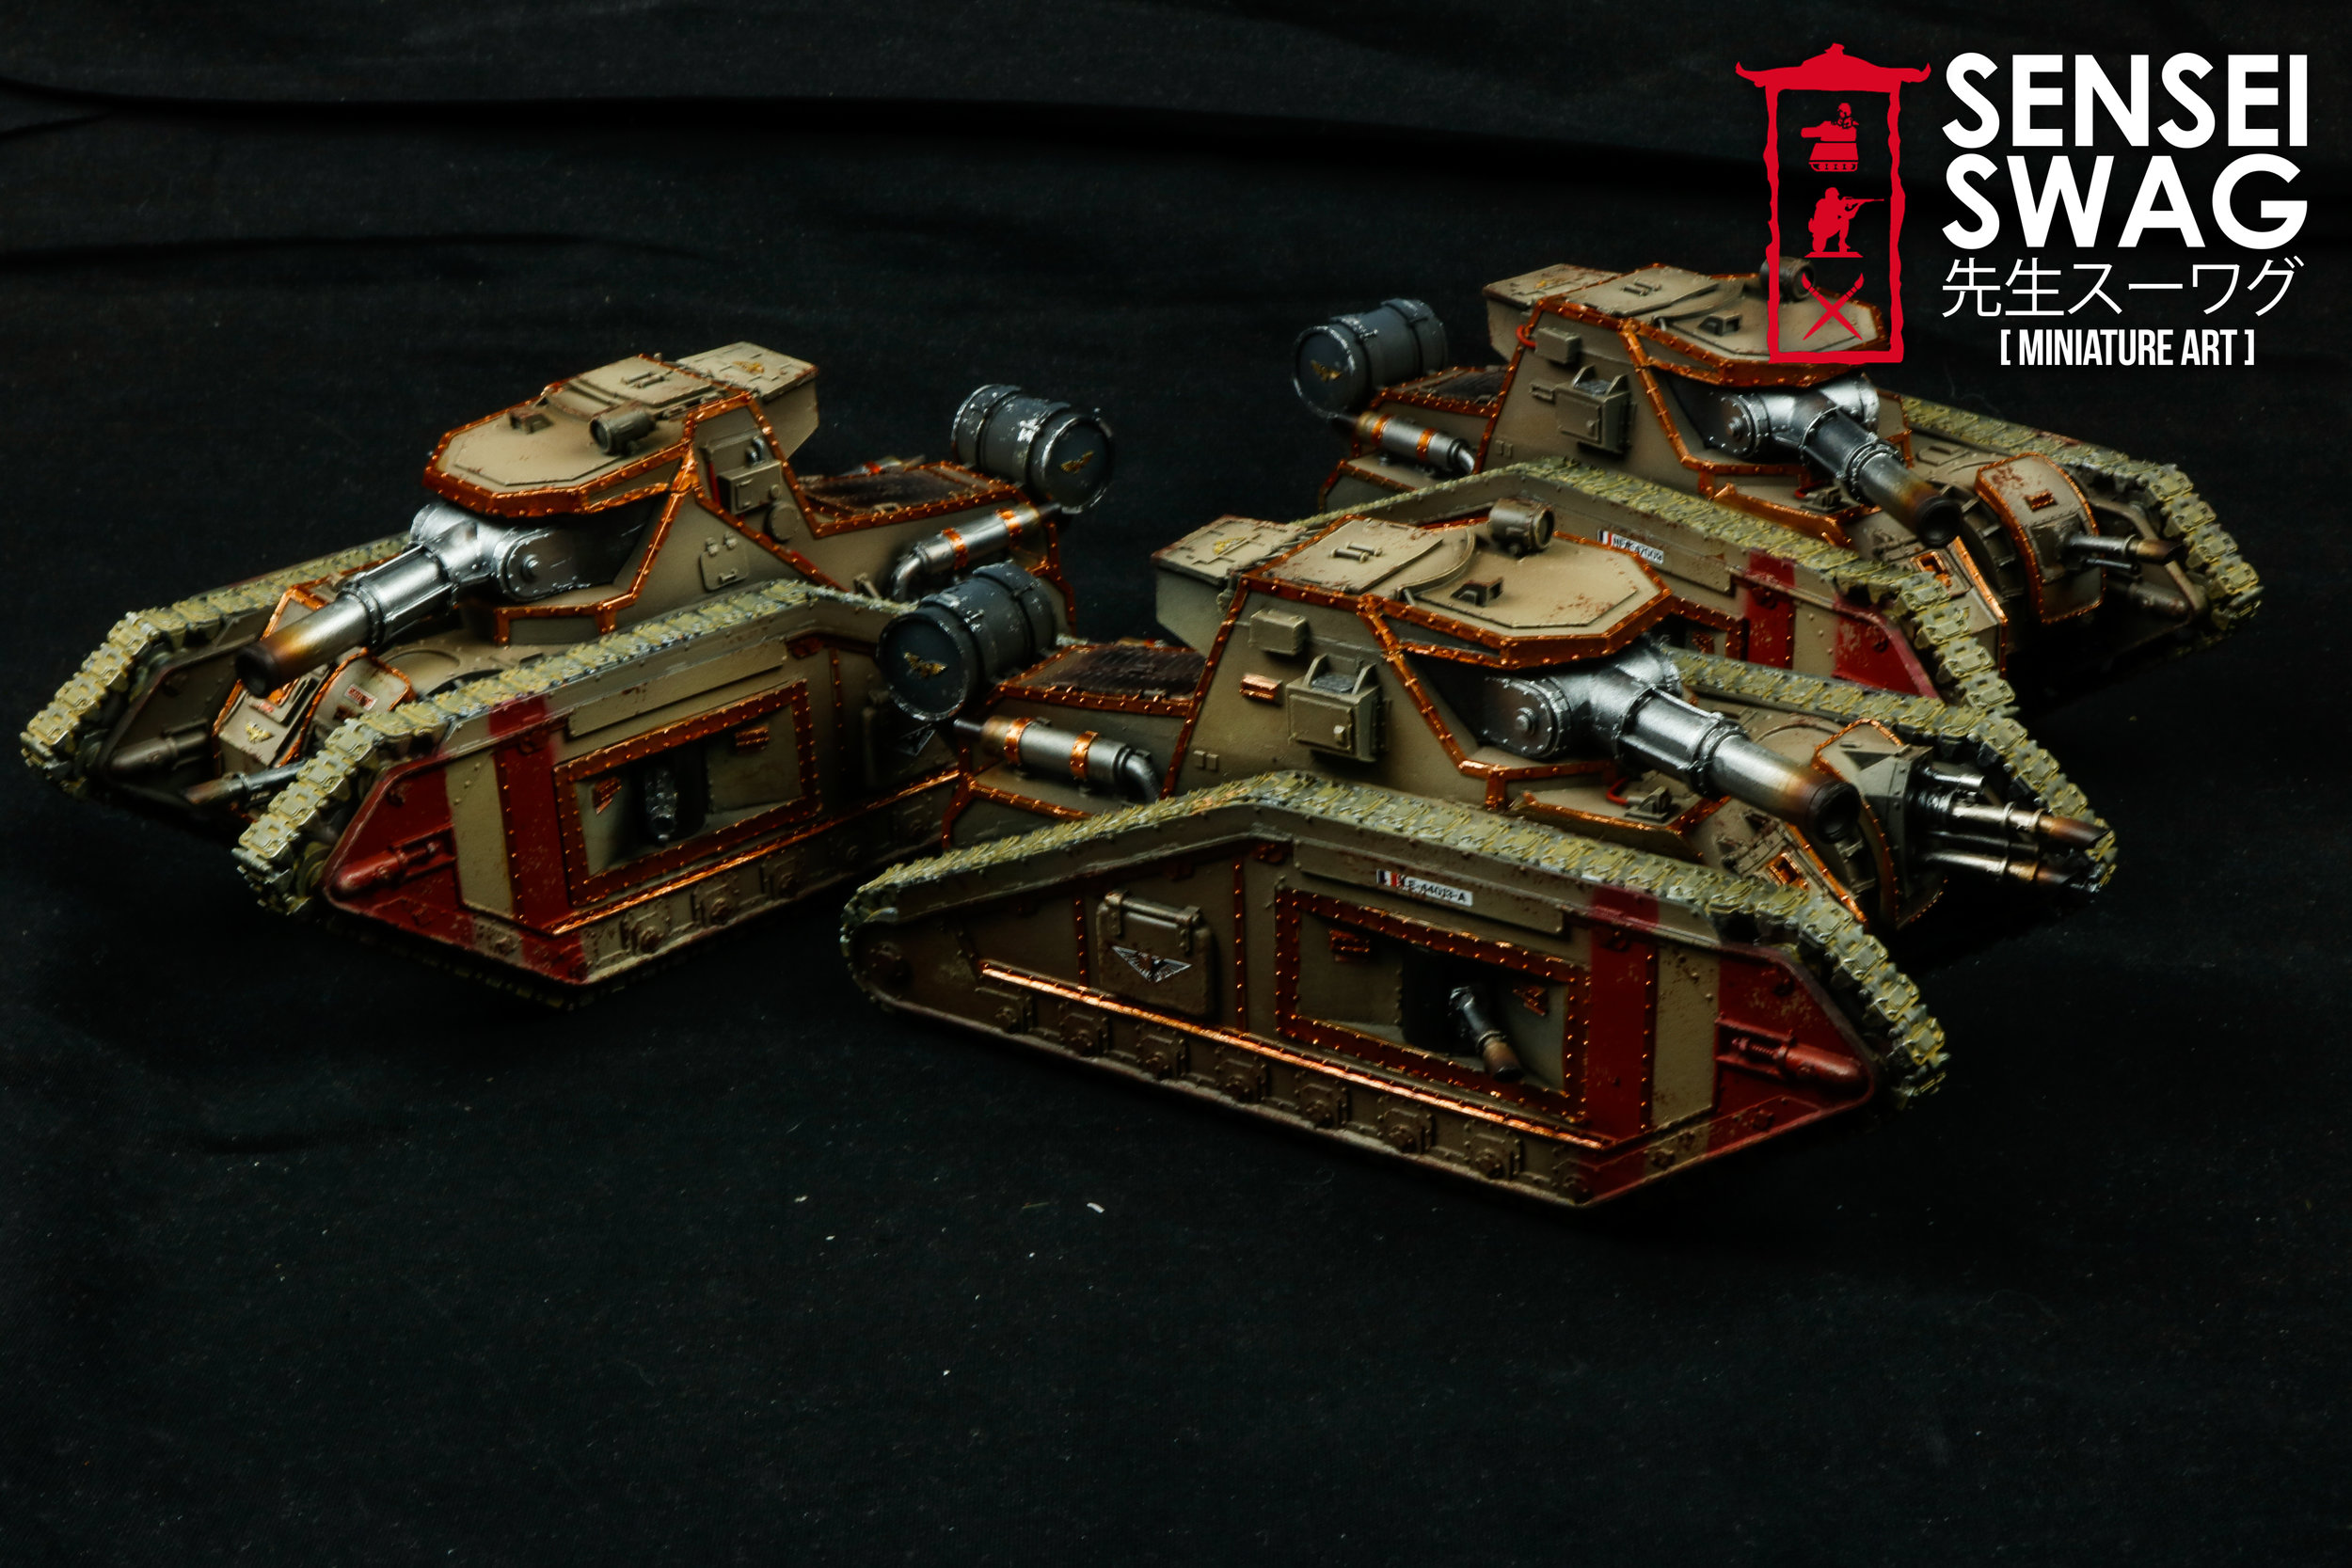 Vostroyan Heavy Tanks Armor Malcador Dracosan Medusa-3.jpg